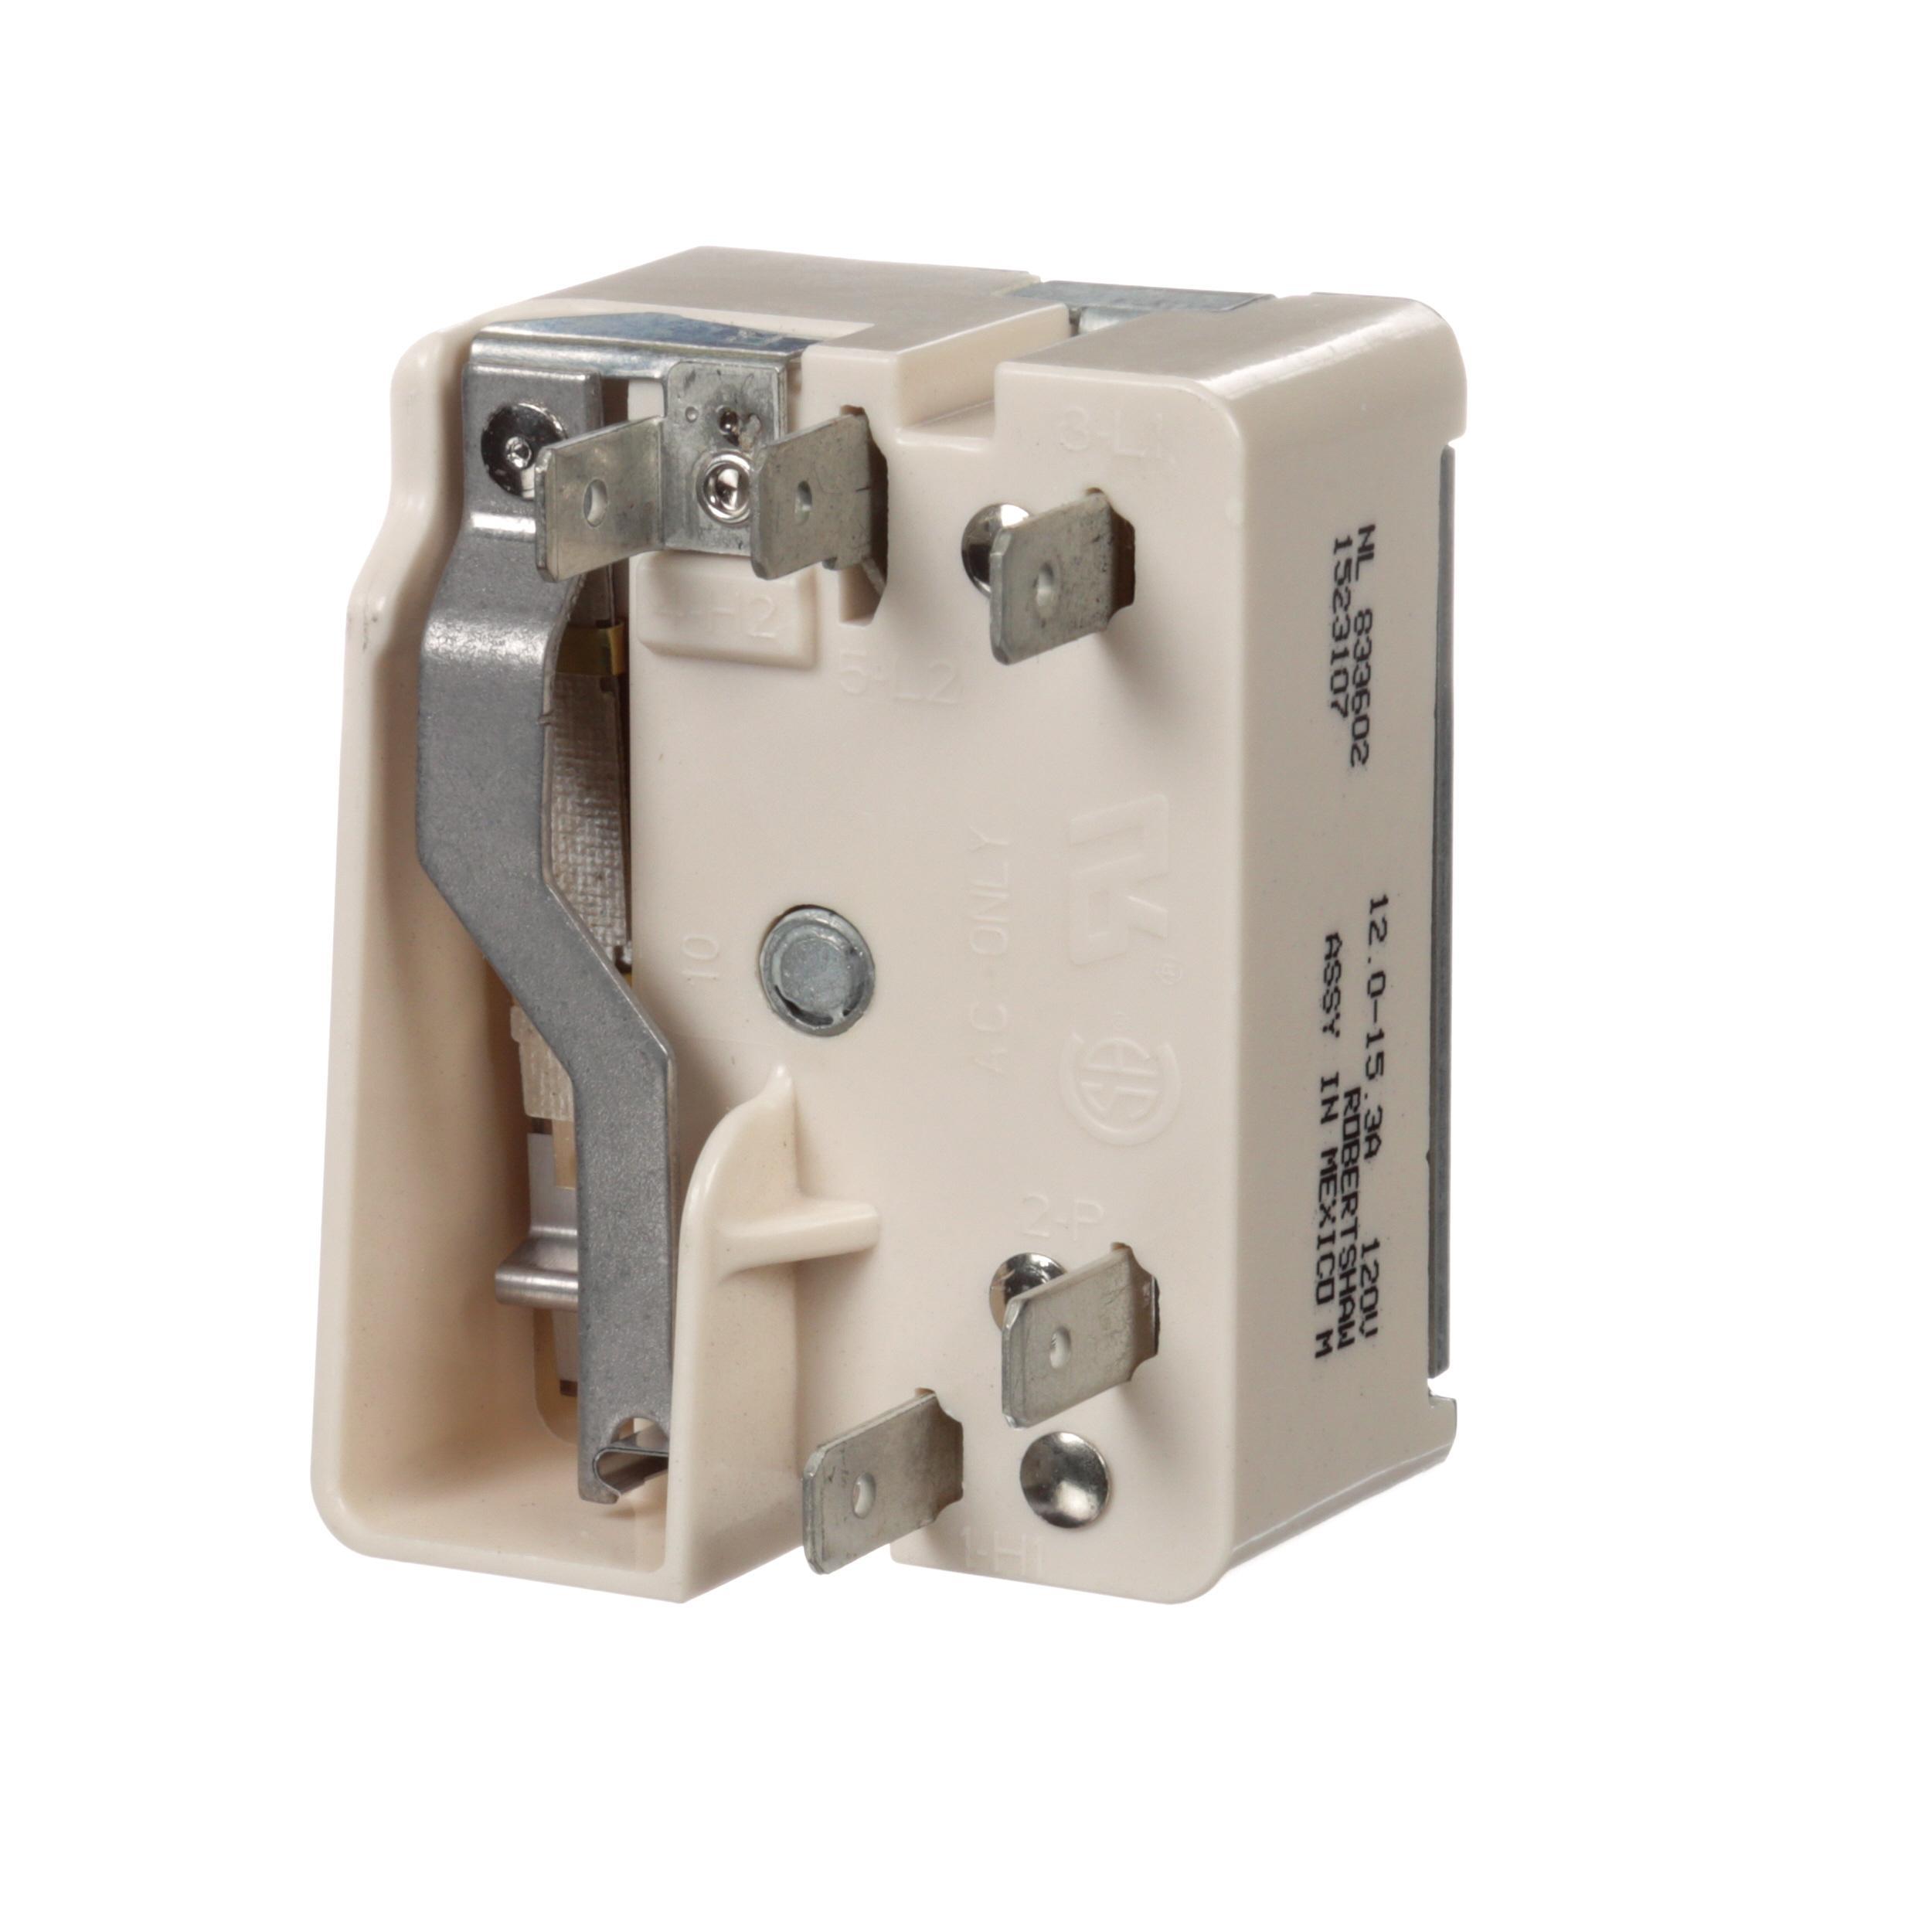 GRINDMASTER INFINITE CONTROL  120V